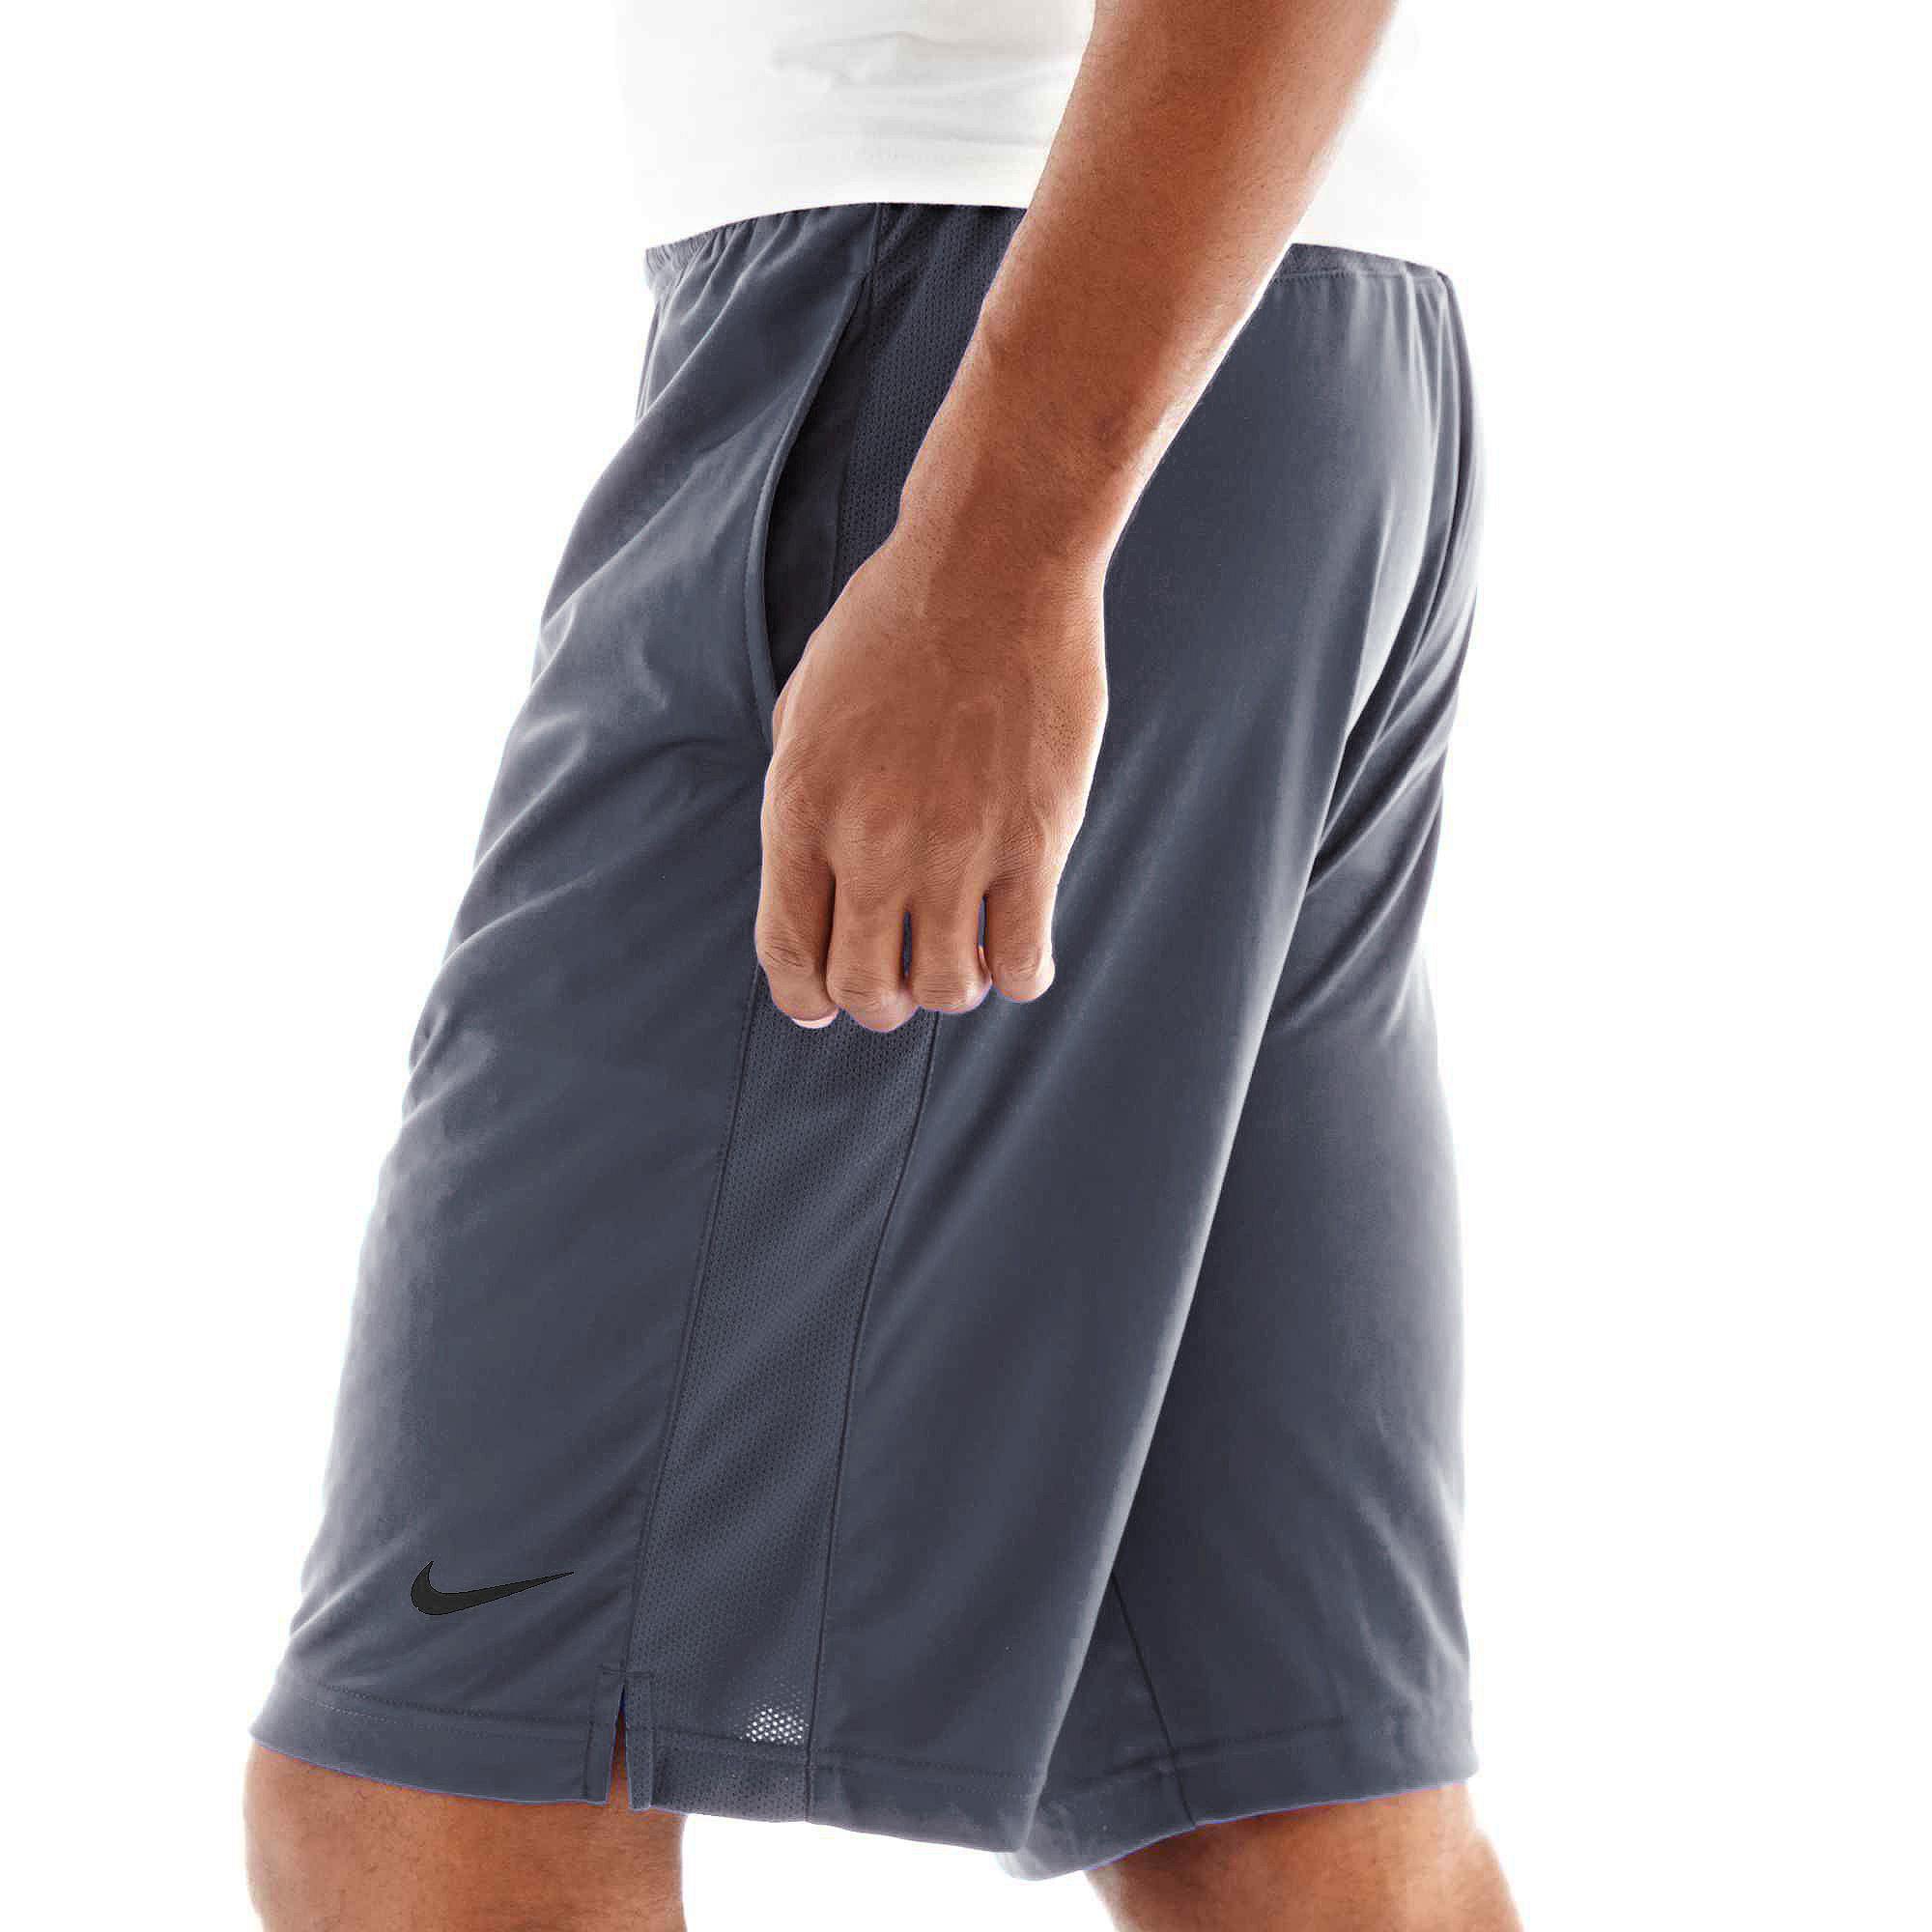 Shorts Fit Training Dri Core Knit 885176089789 Nike Upc v0Sq1wy